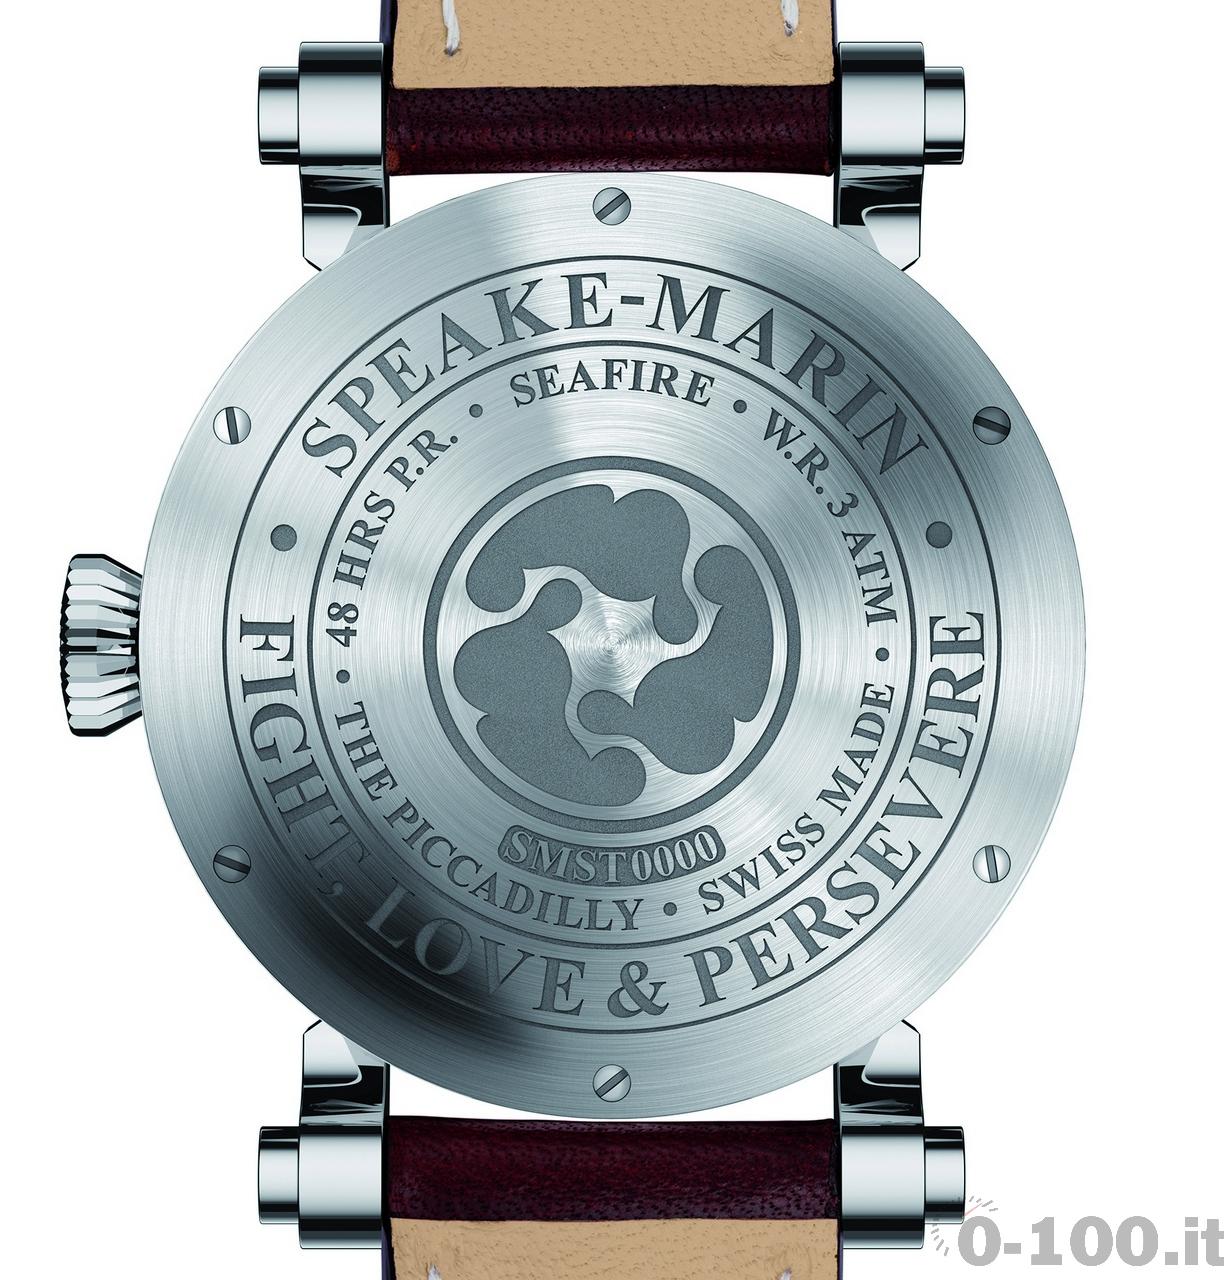 anteprima-baselworld-2014-speake-marin-spirit-seafire-cronograph-prezzo-price_0-1005